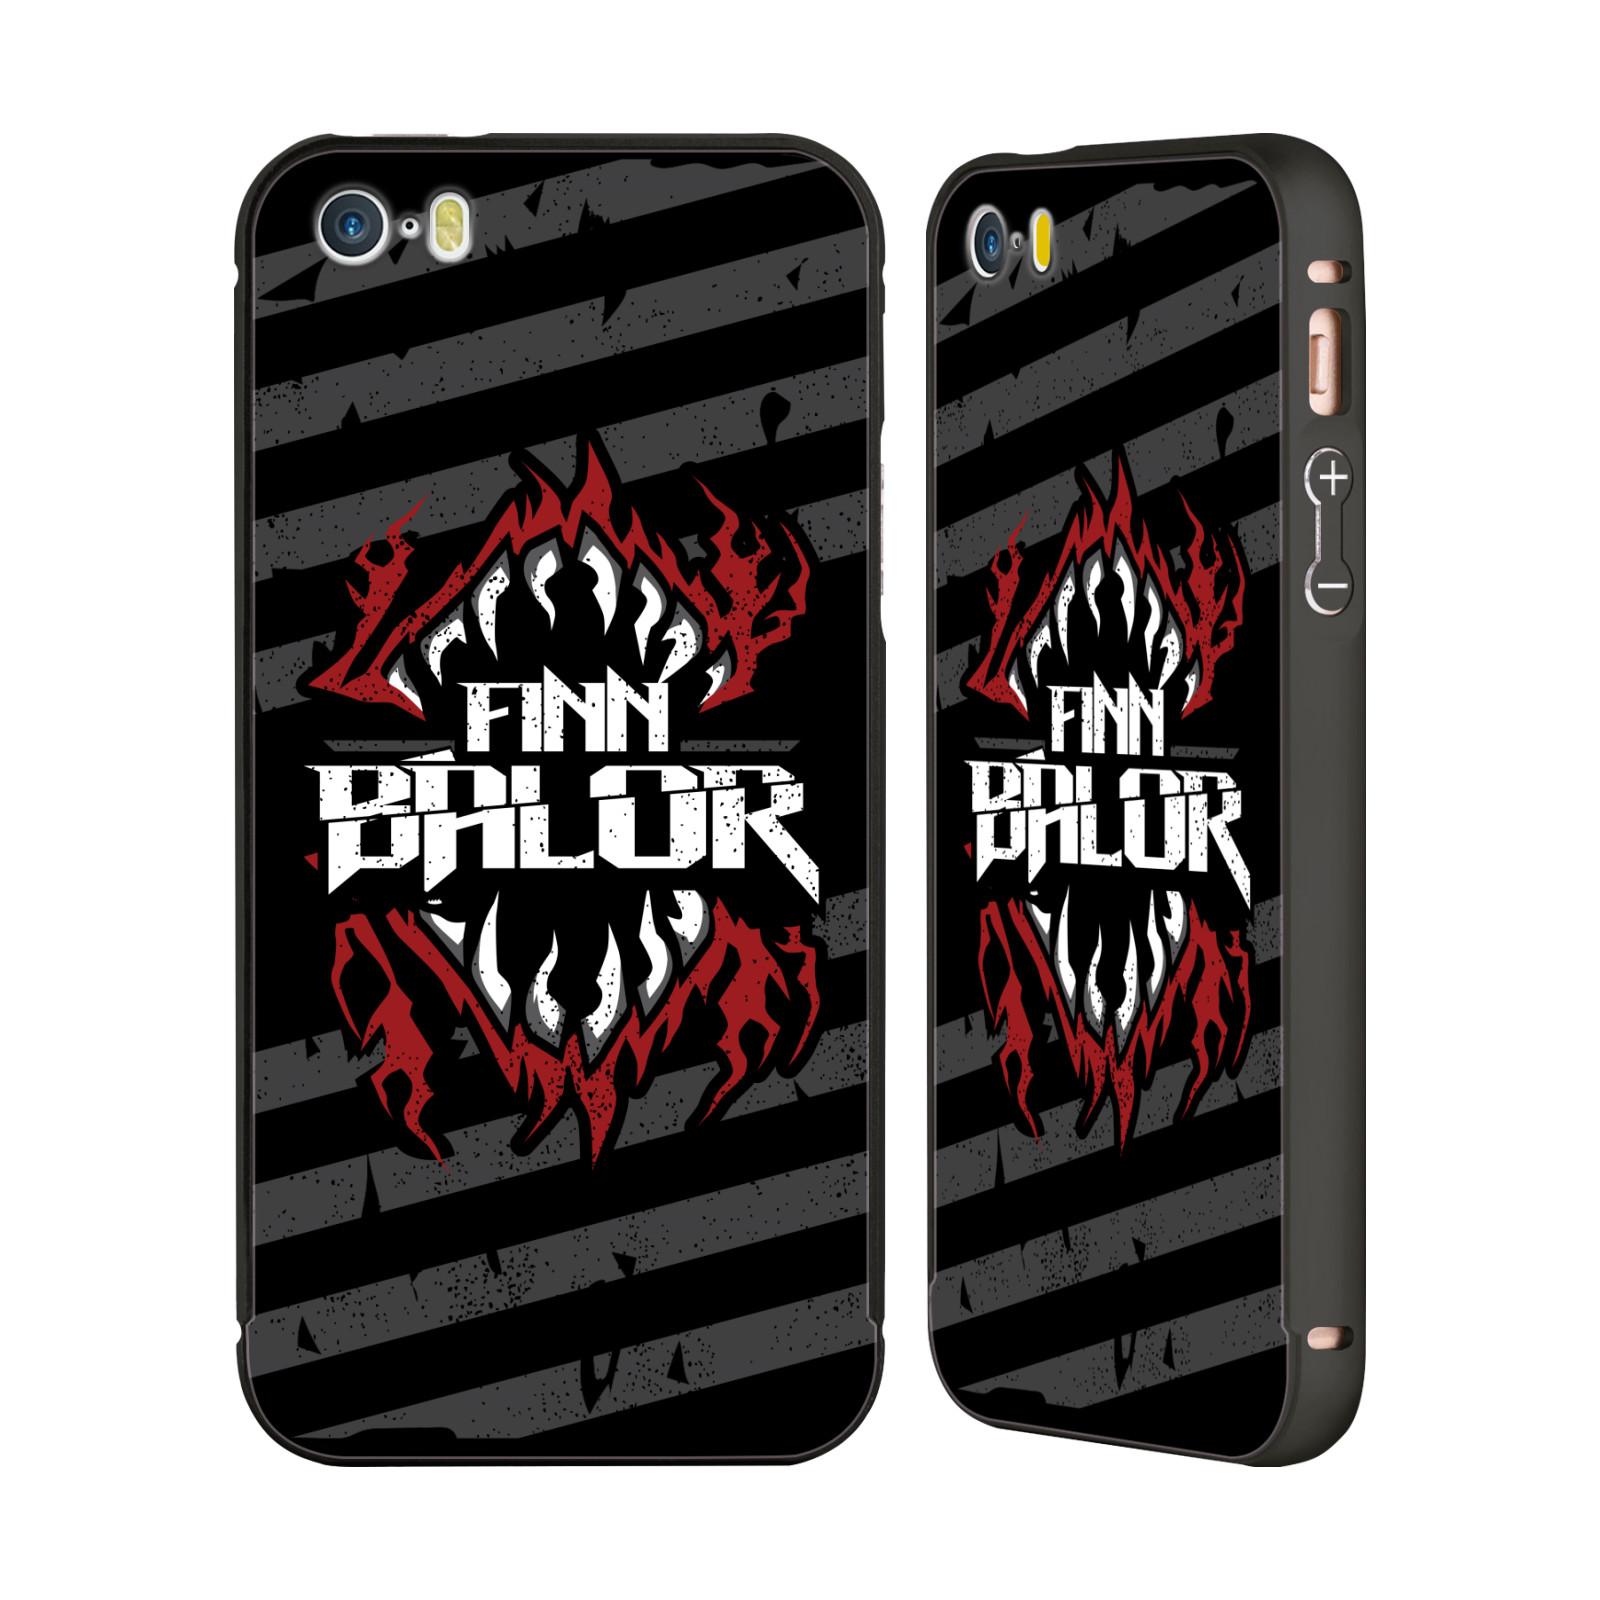 OFFIZIELLE-WWE-2017-FINN-BALOR-SCHWARZ-RAHMEN-HULLE-FUR-APPLE-iPHONE-HANDYS